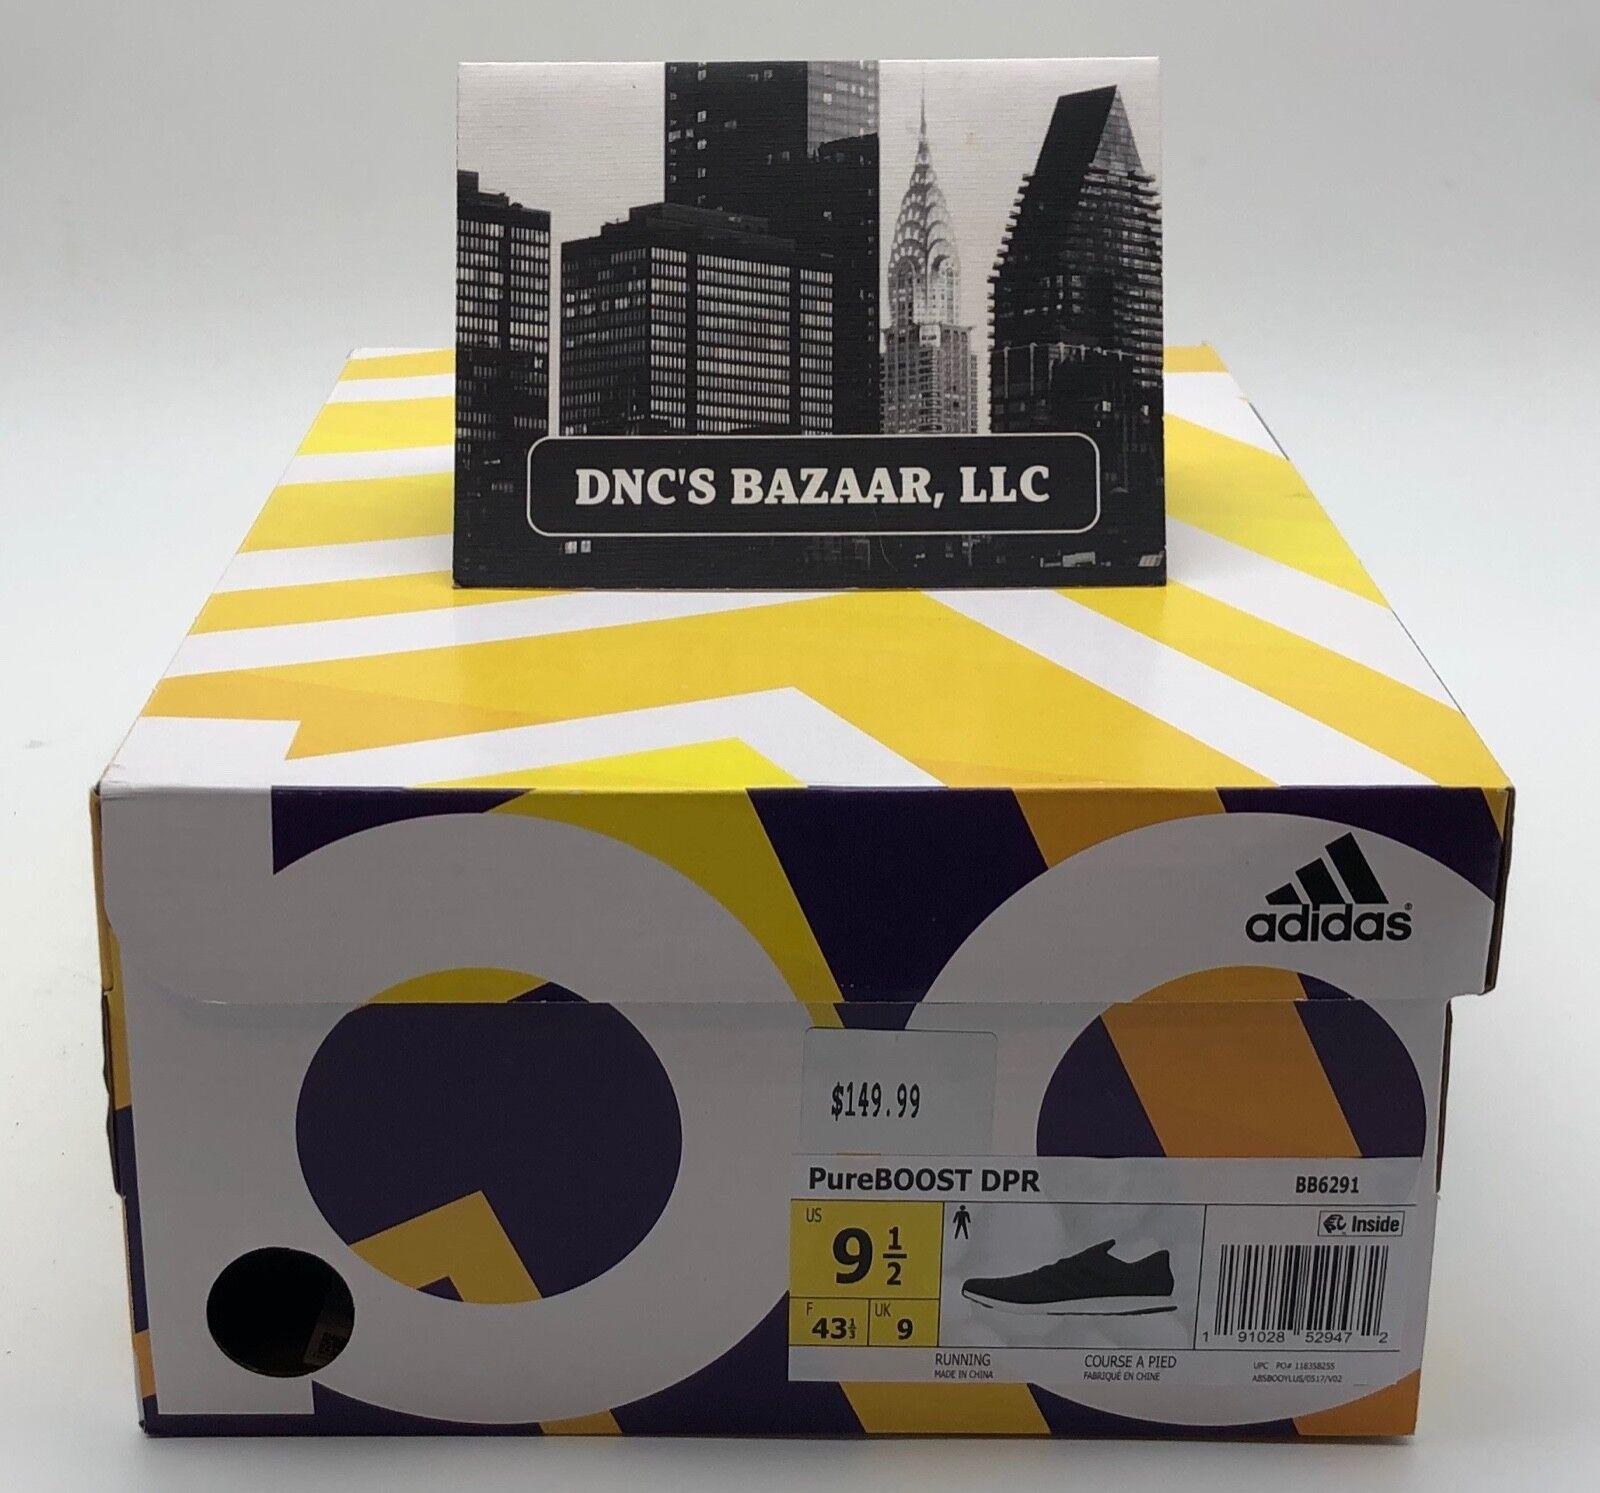 Adidas PureBOOST DPR (Empty Box)